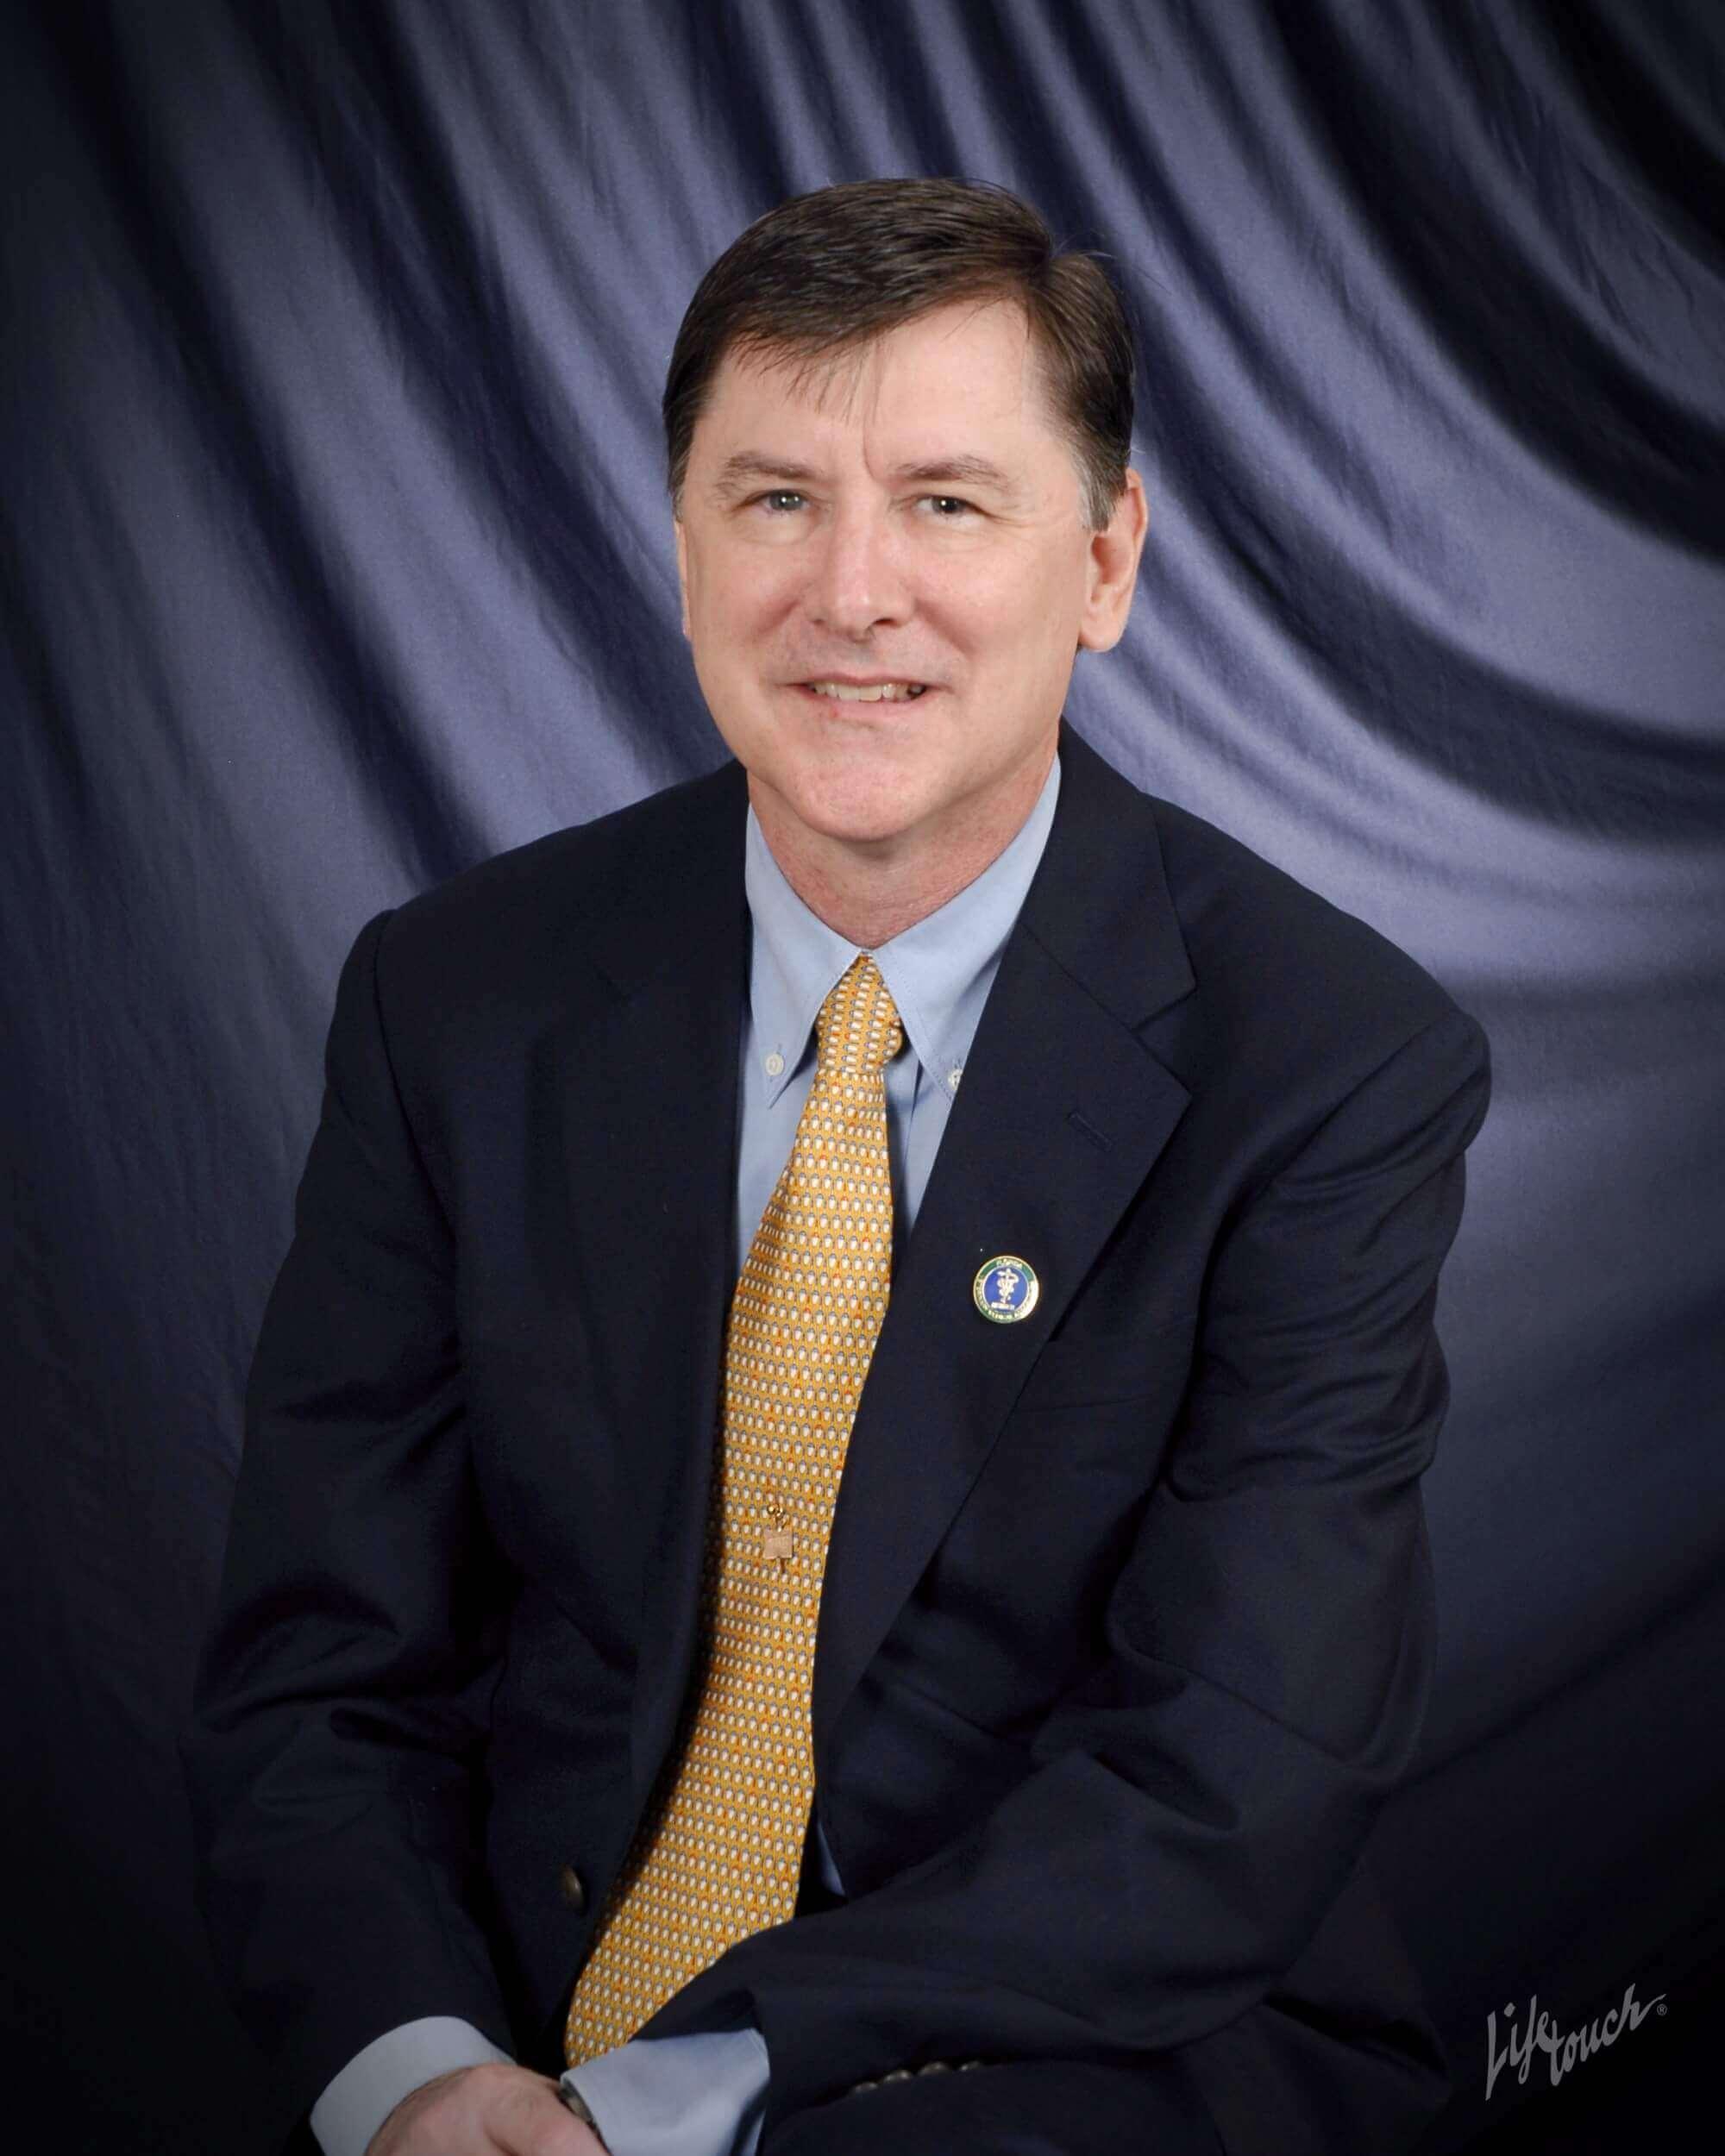 Dr. Marc Presnell